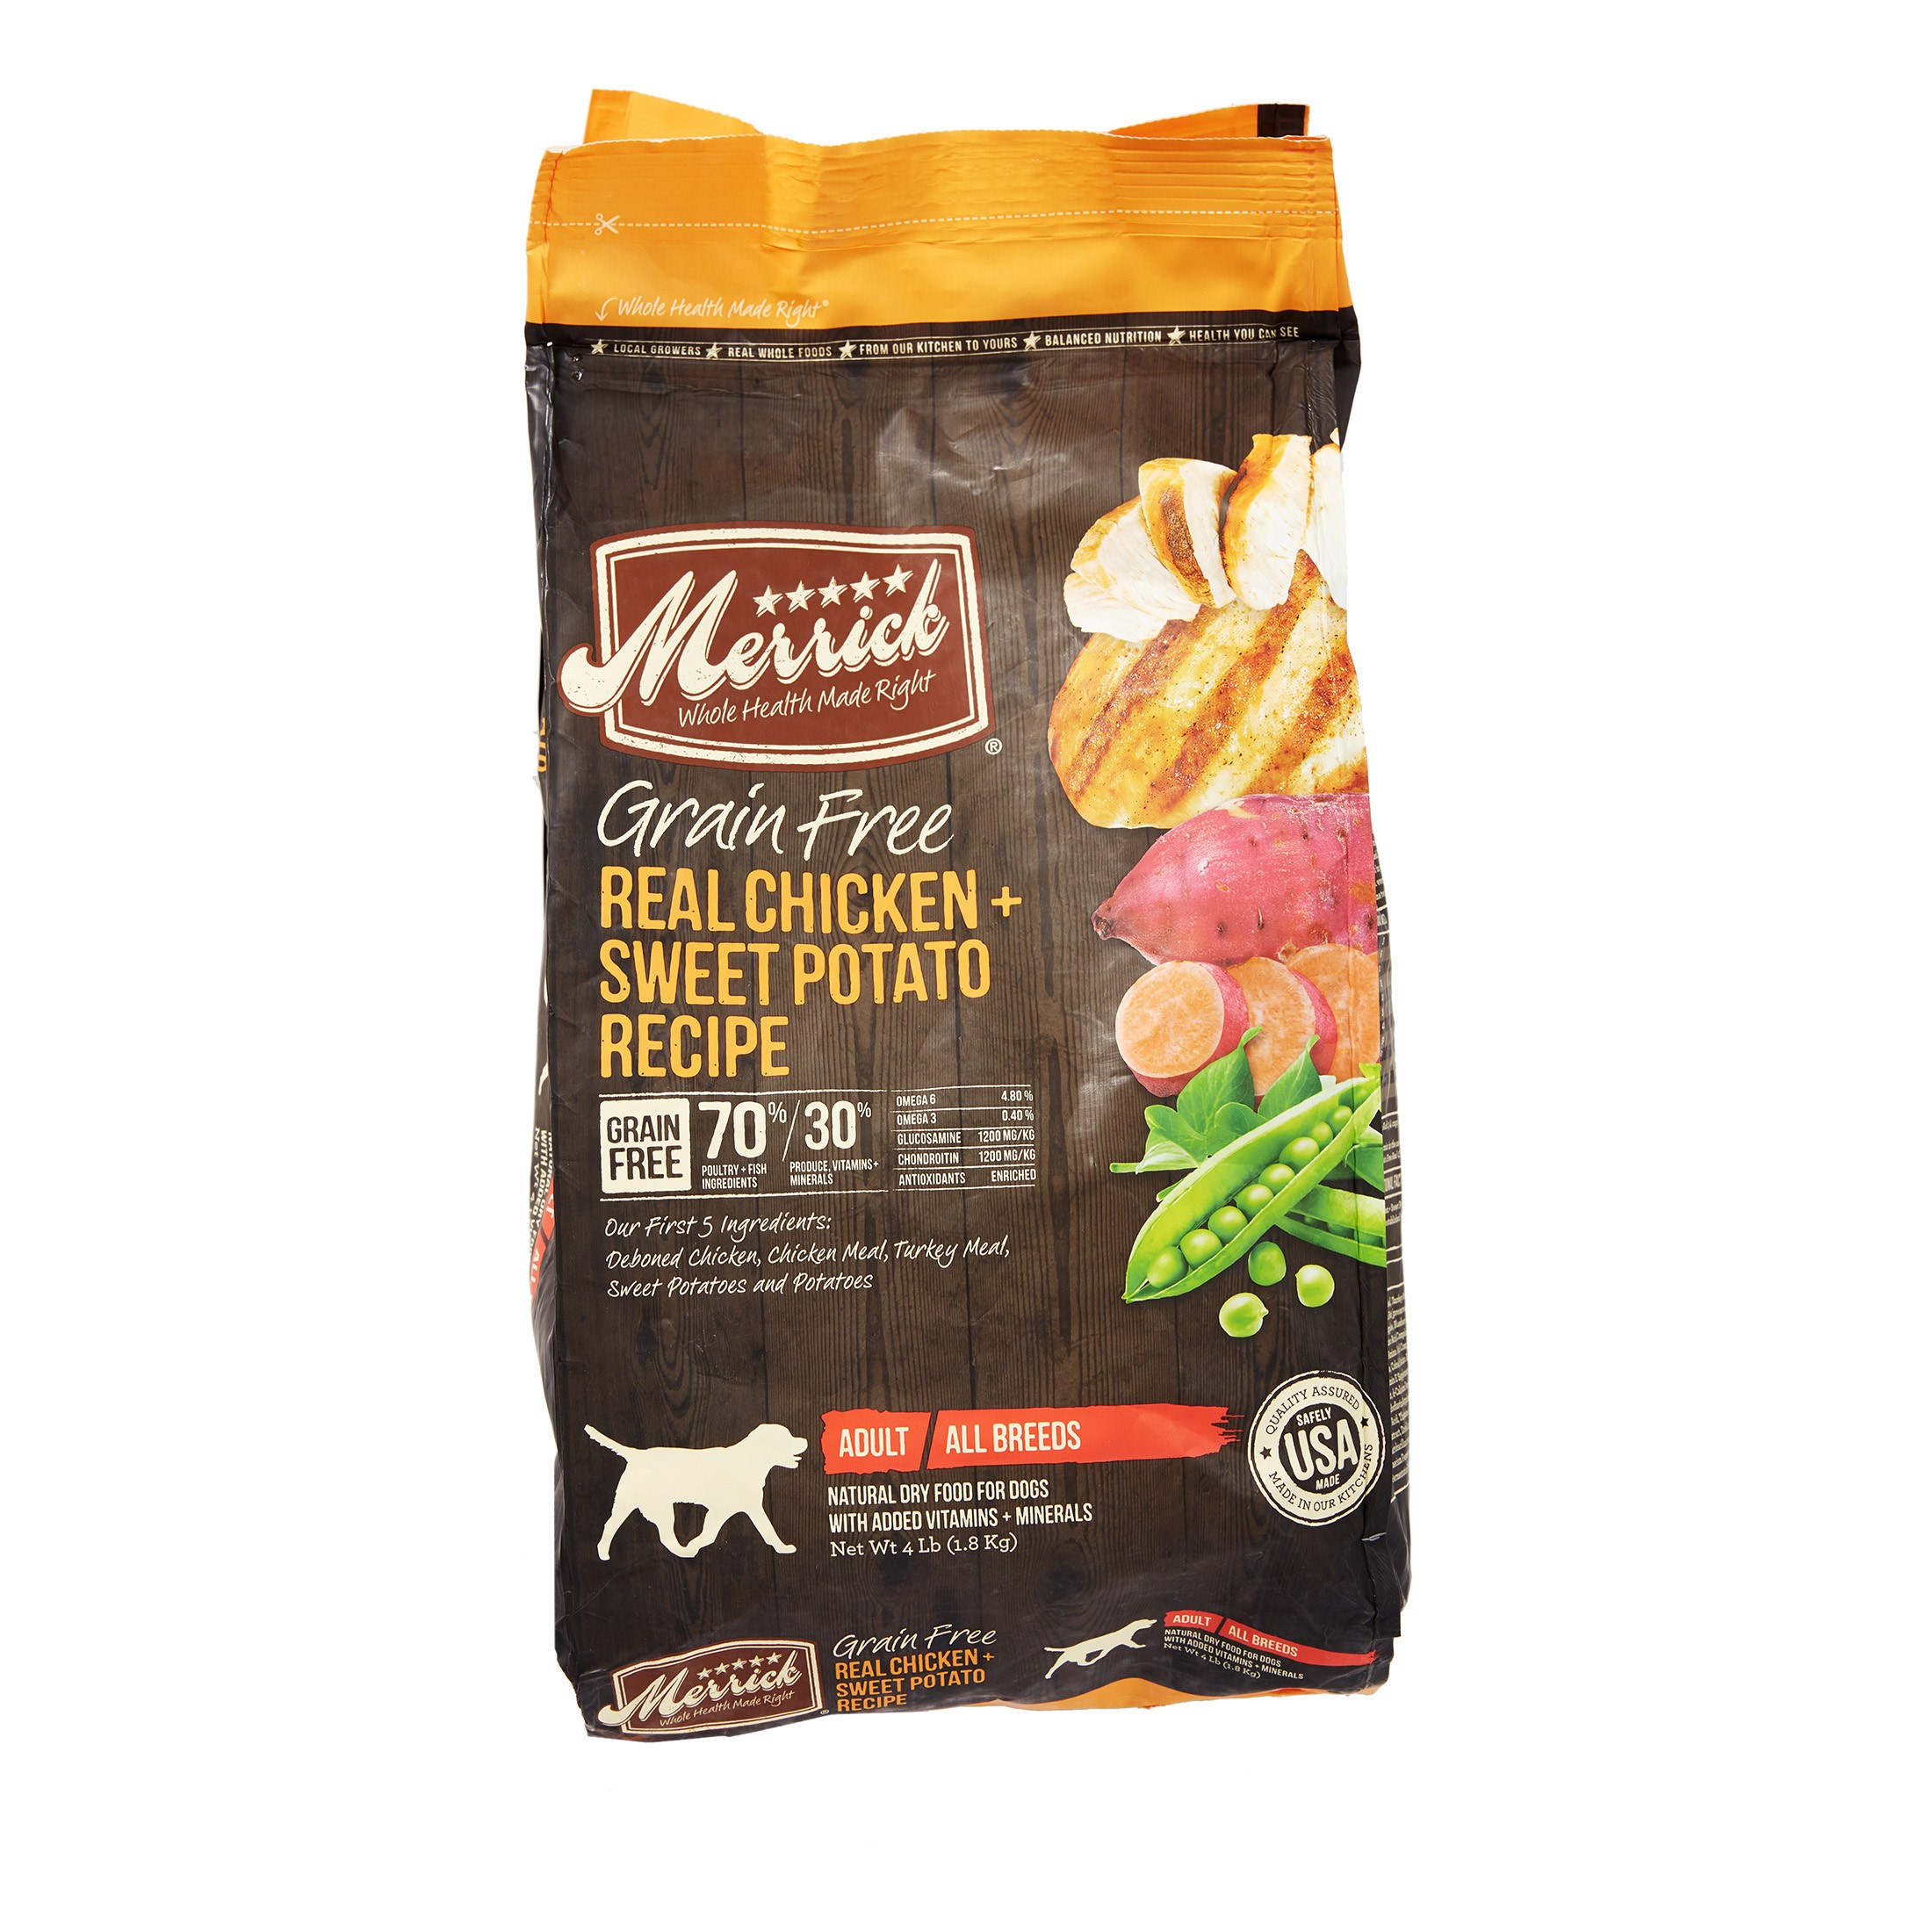 Merrick Grain-Free Real Chicken + Sweet Potato Recipe Dry Dog Food, 4 lb